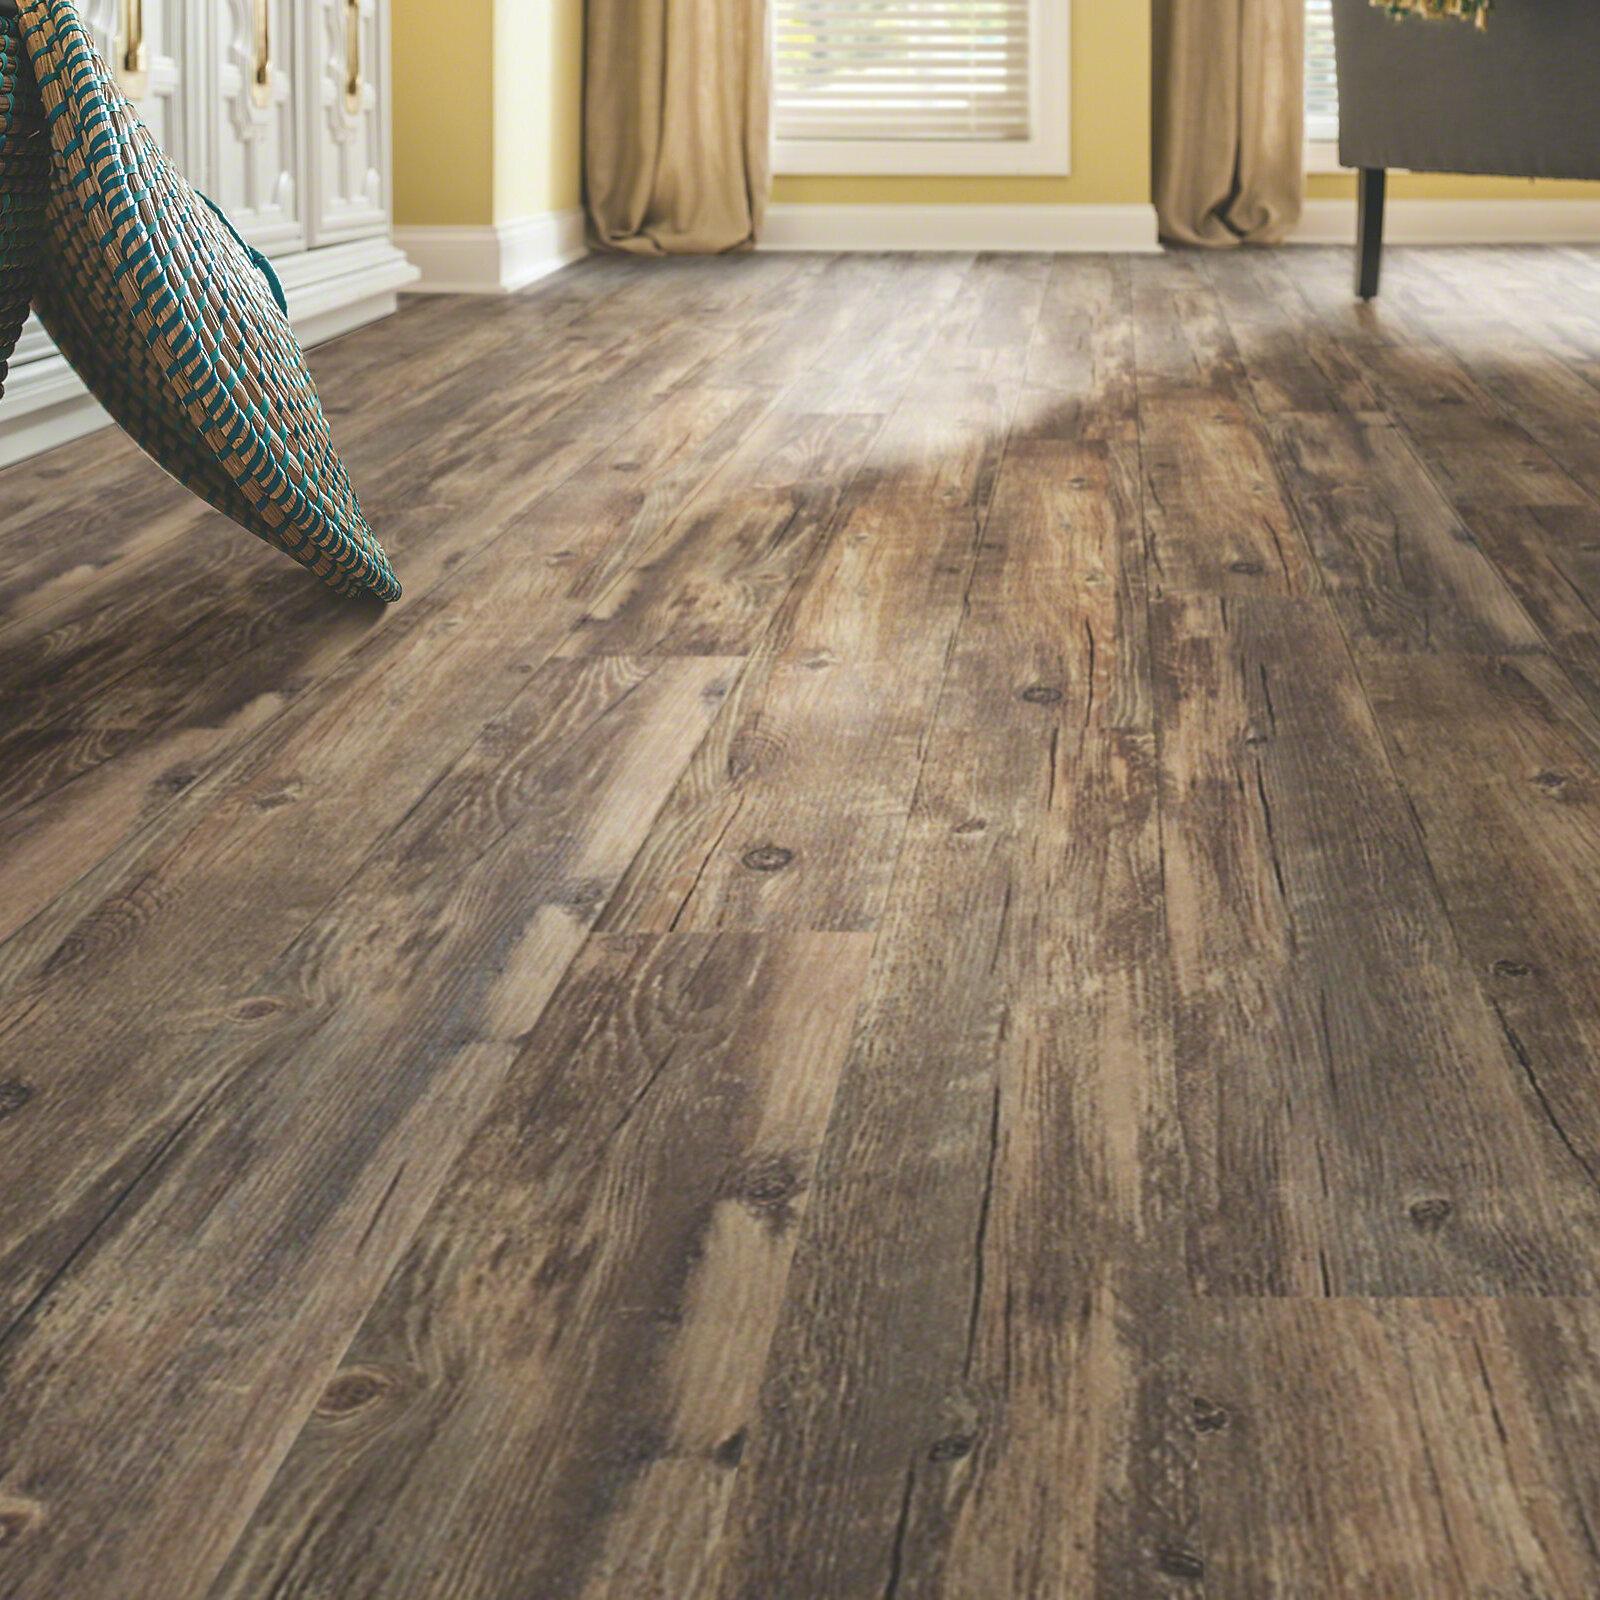 Shaw floors world 39 s fair 12 6 x 48 x 2mm luxury vinyl for New home flooring